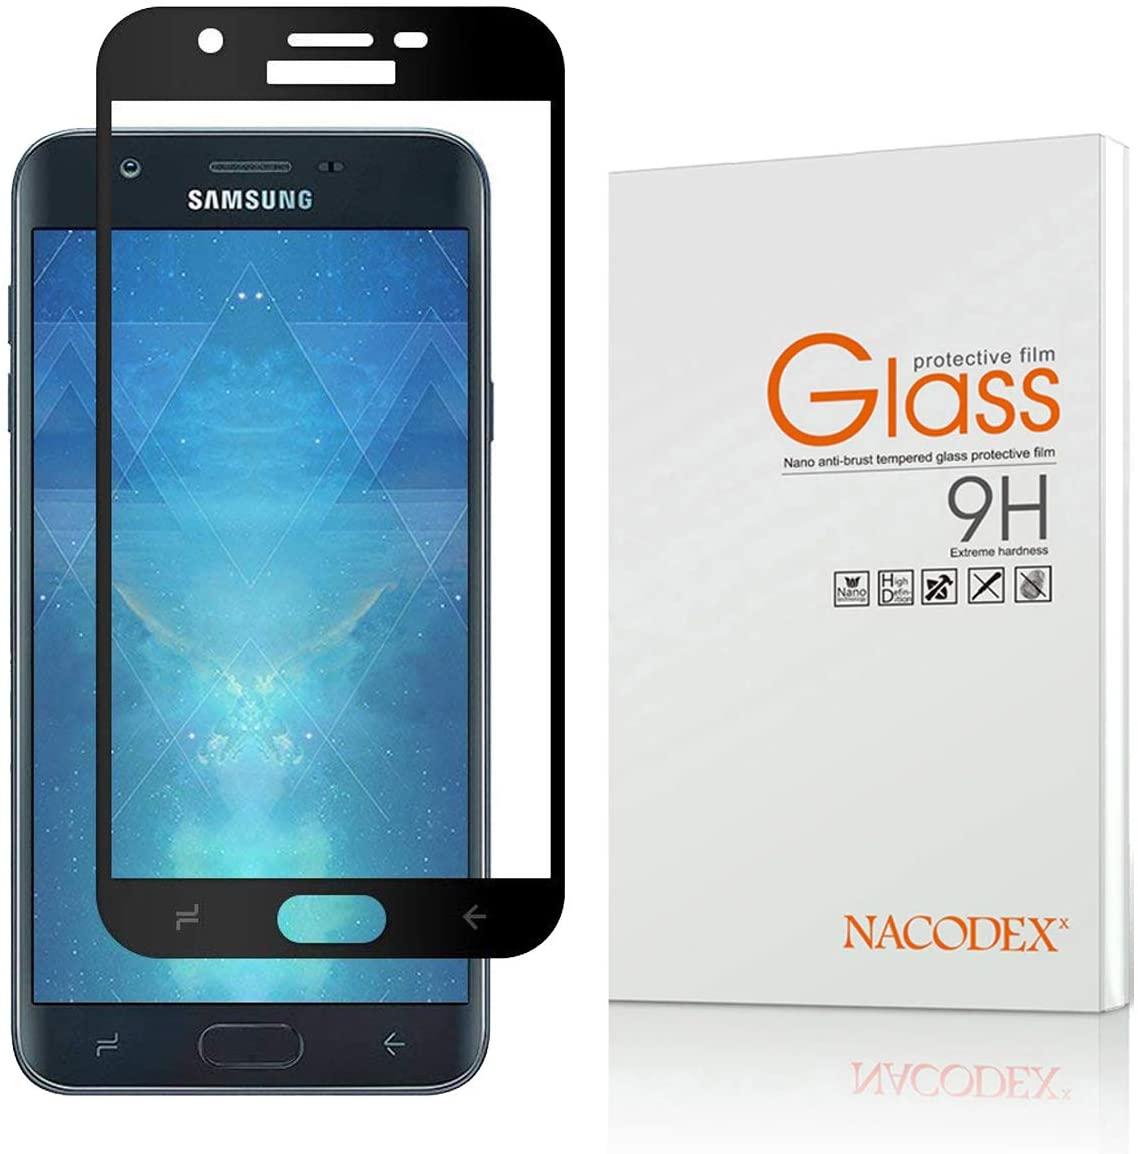 Full Coverage Screen Protector Compatible Samsung Galaxy J7 Refine 2018, Nacodex Anti-Scratch -Black Tempered Glass for J7 Star/J7 Eon 2018